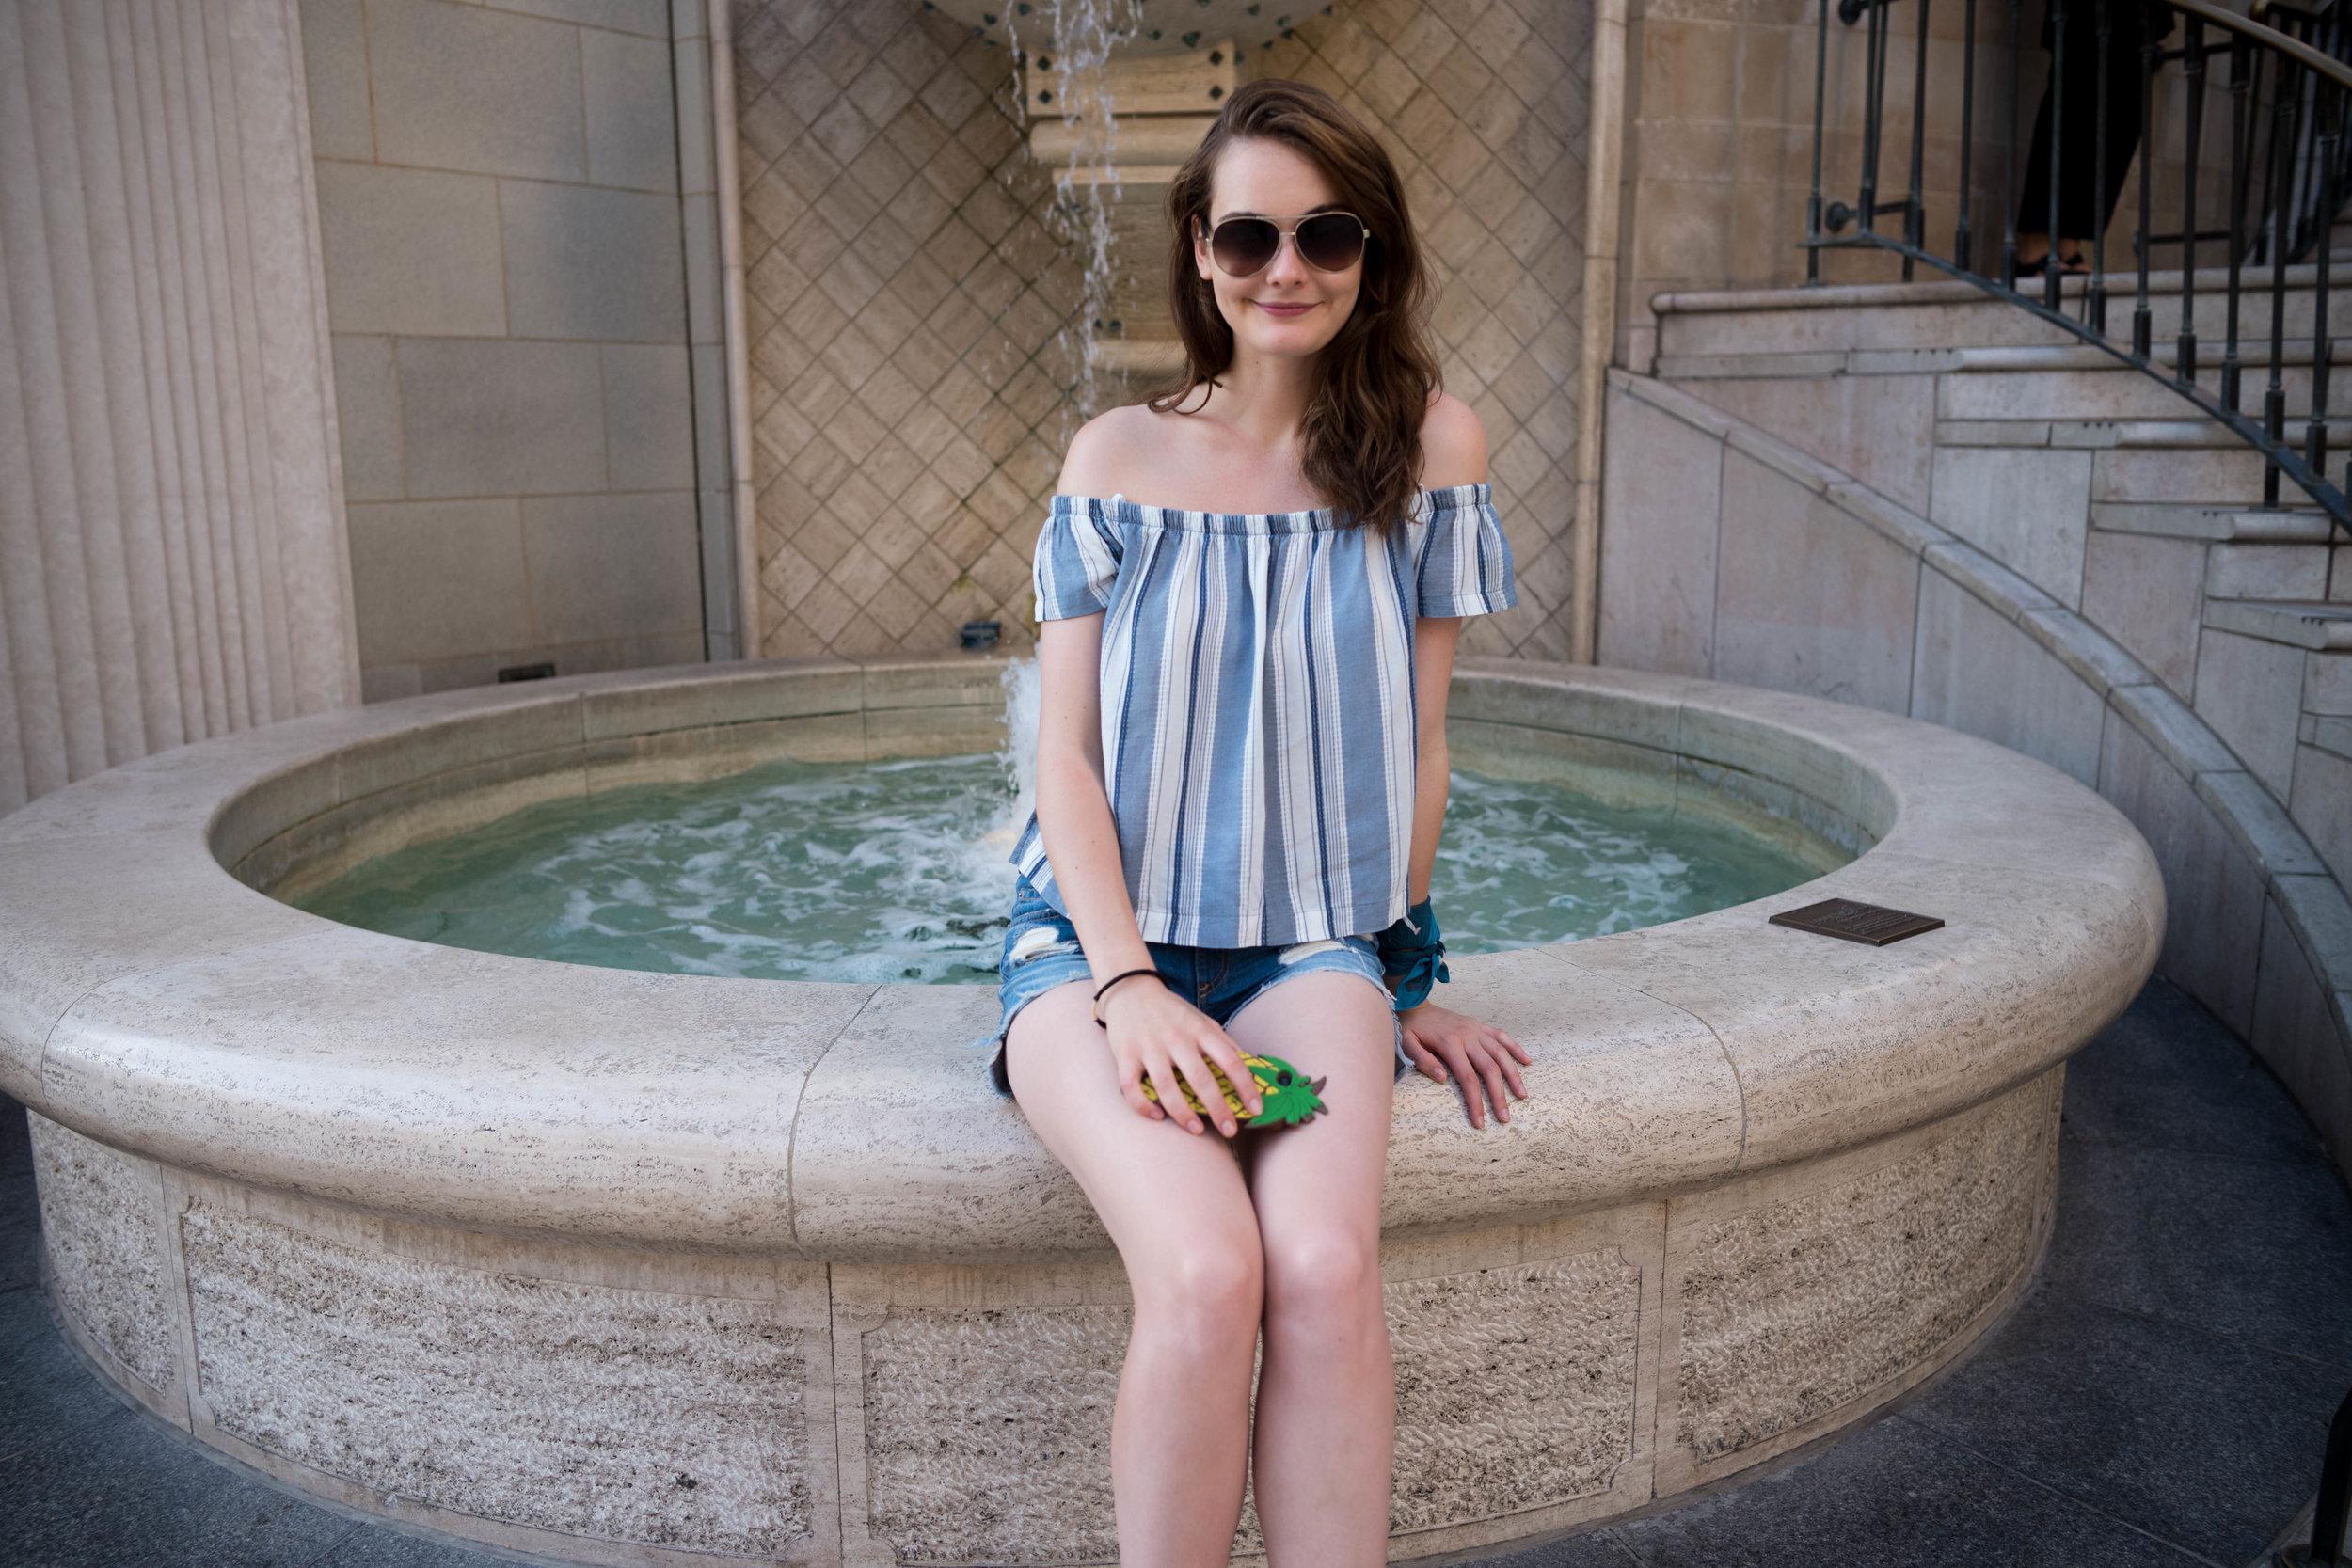 On a fountain at Via Rodeo. Leica 28mm f/1.4 Summilux ASPH